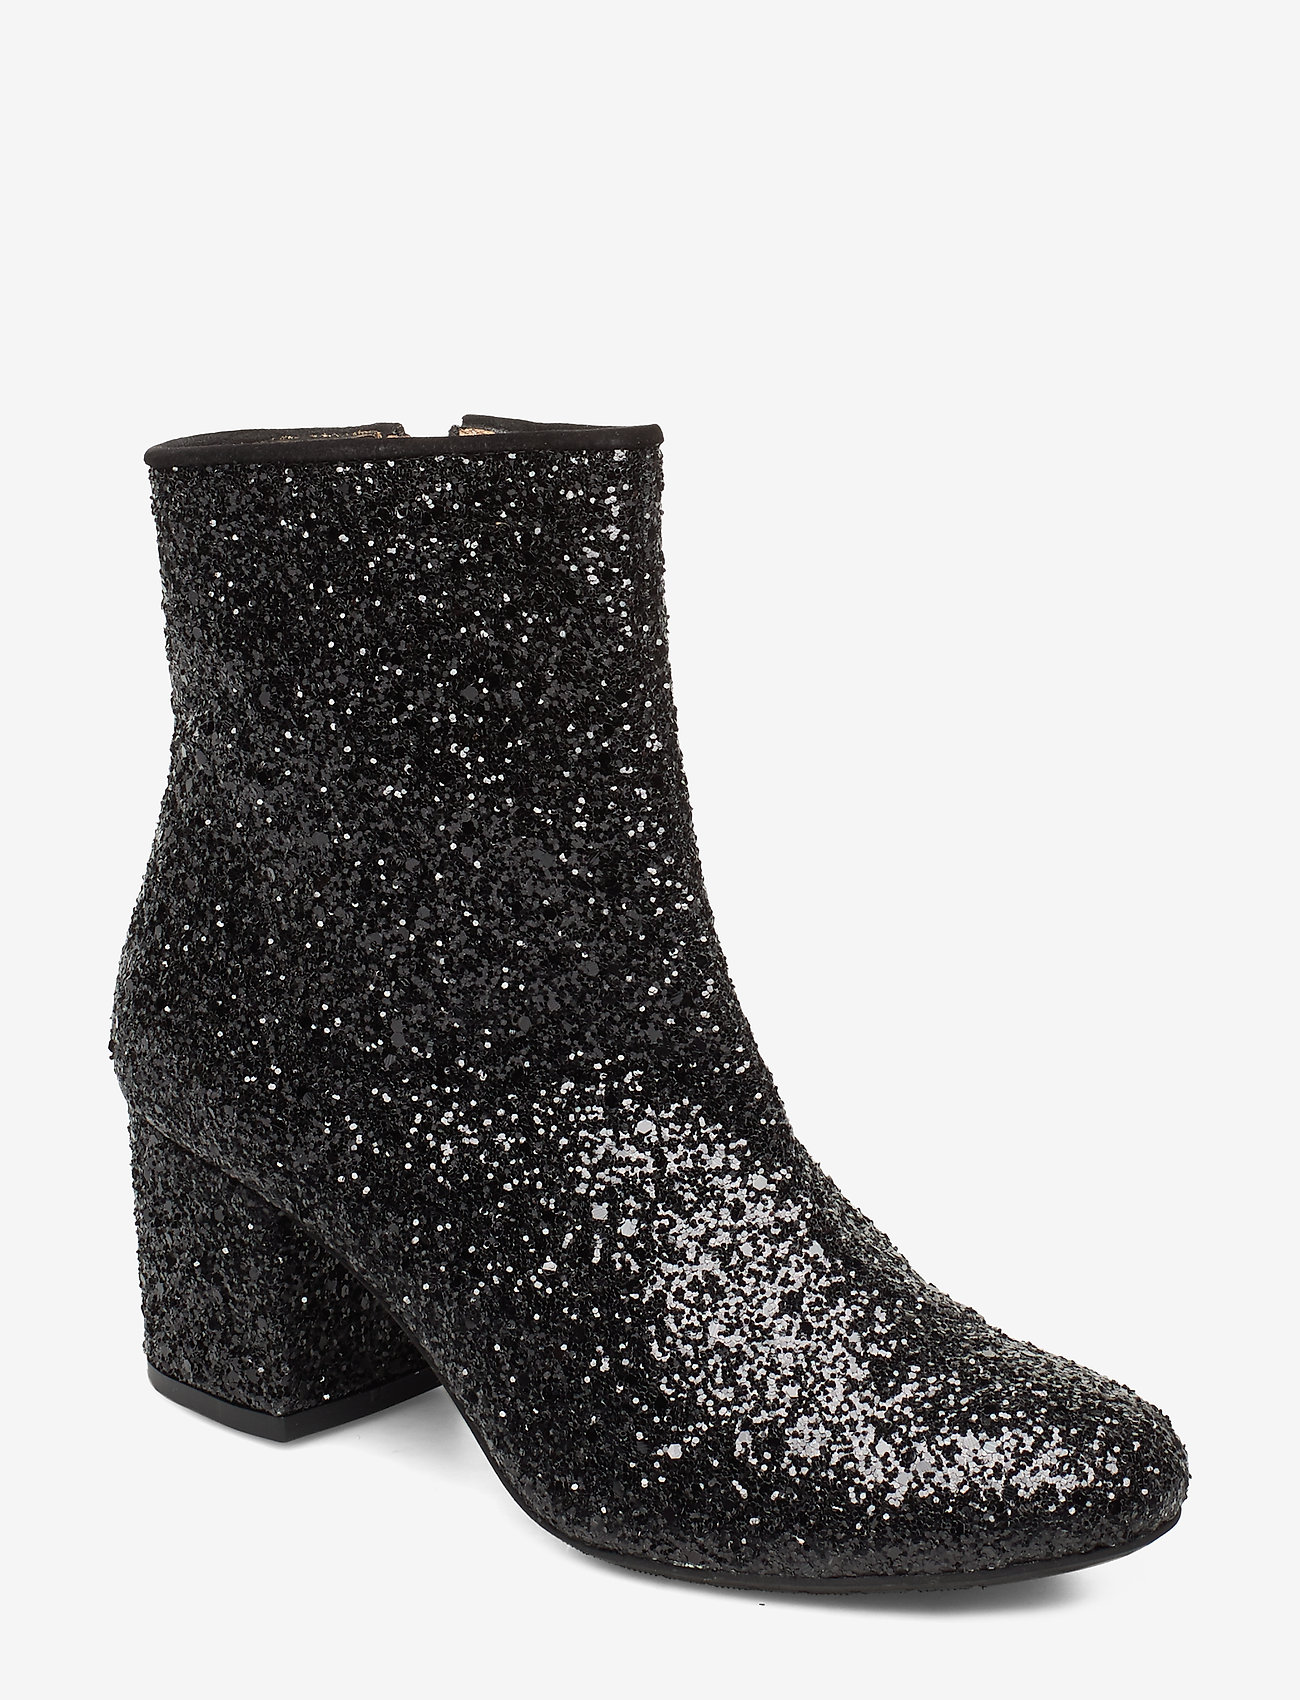 ANGULUS - Bootie - block heel - with zippe - enkellaarsjes met hak - 2486/1163 black glit/black - 0